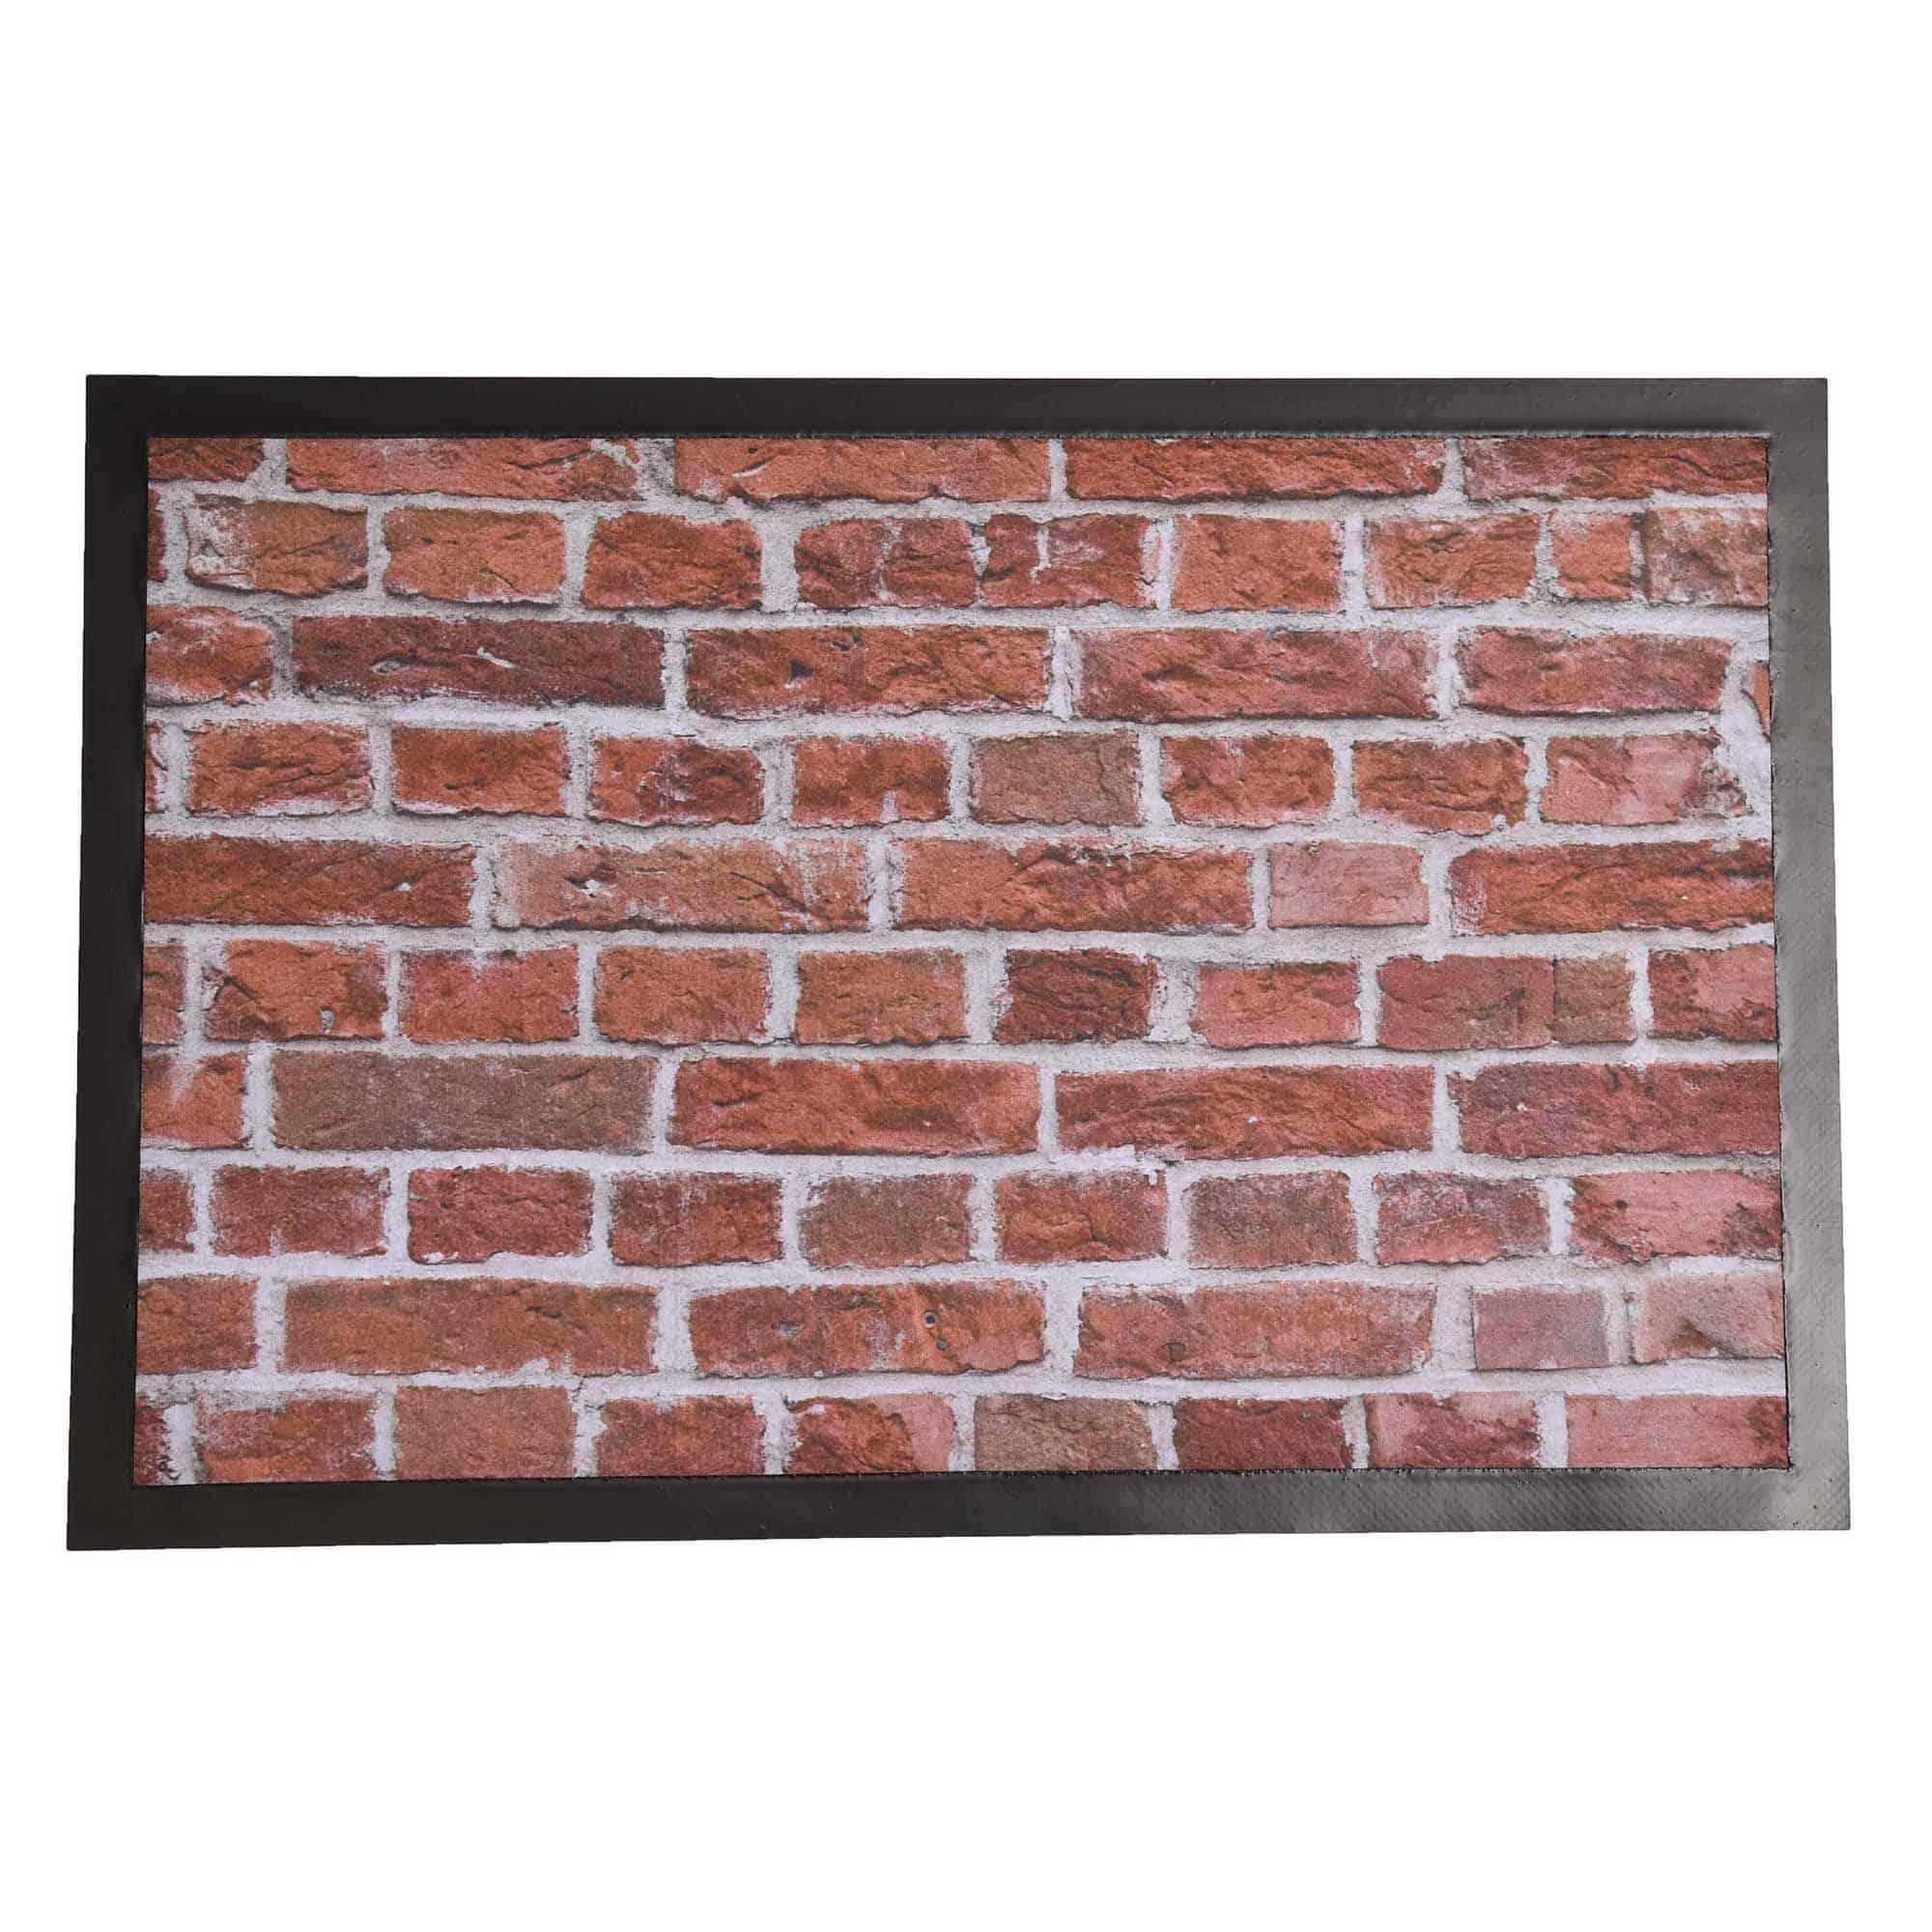 Indoor Printed Door Mat Brick Wall PVC Polyester Rug 24x16